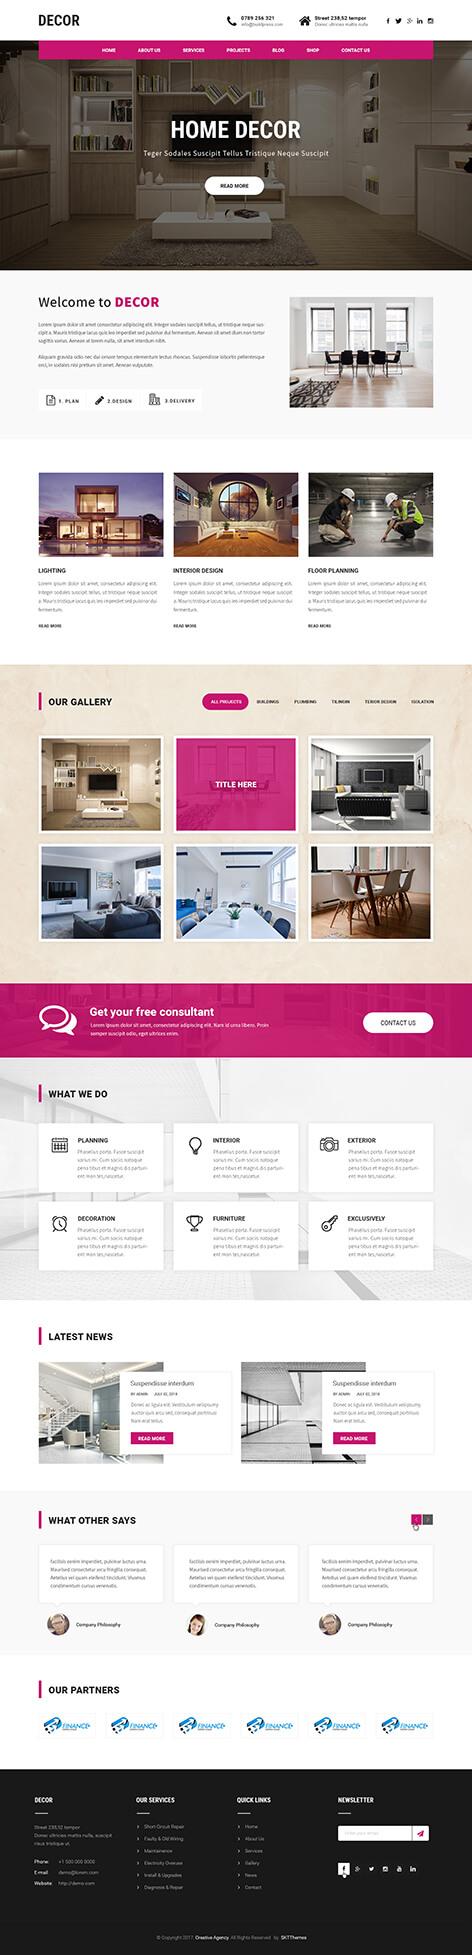 decor WordPress theme